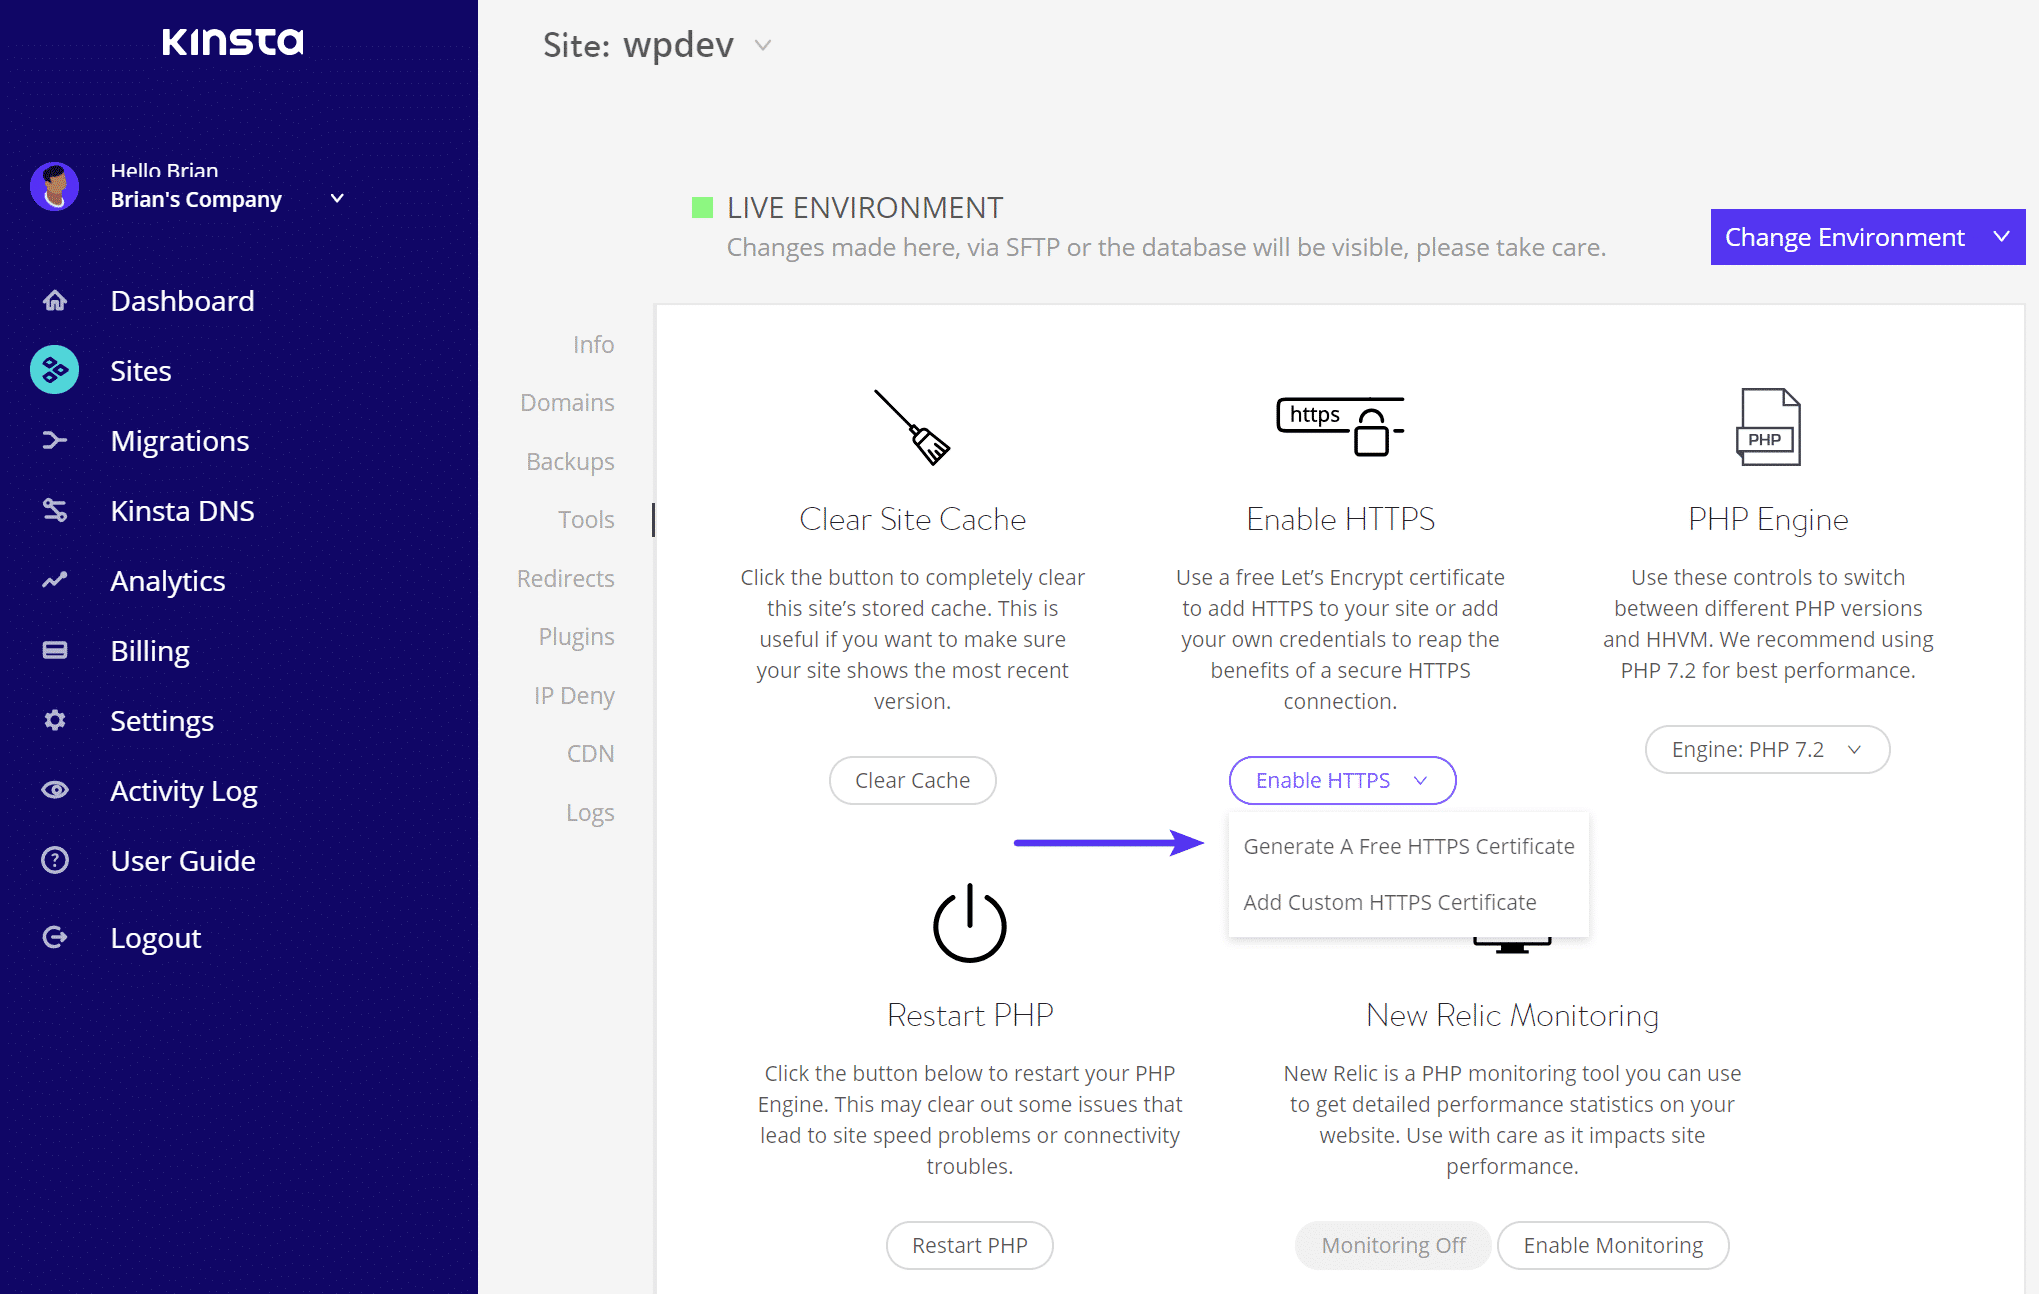 Let's Encrypt証明書を追加する